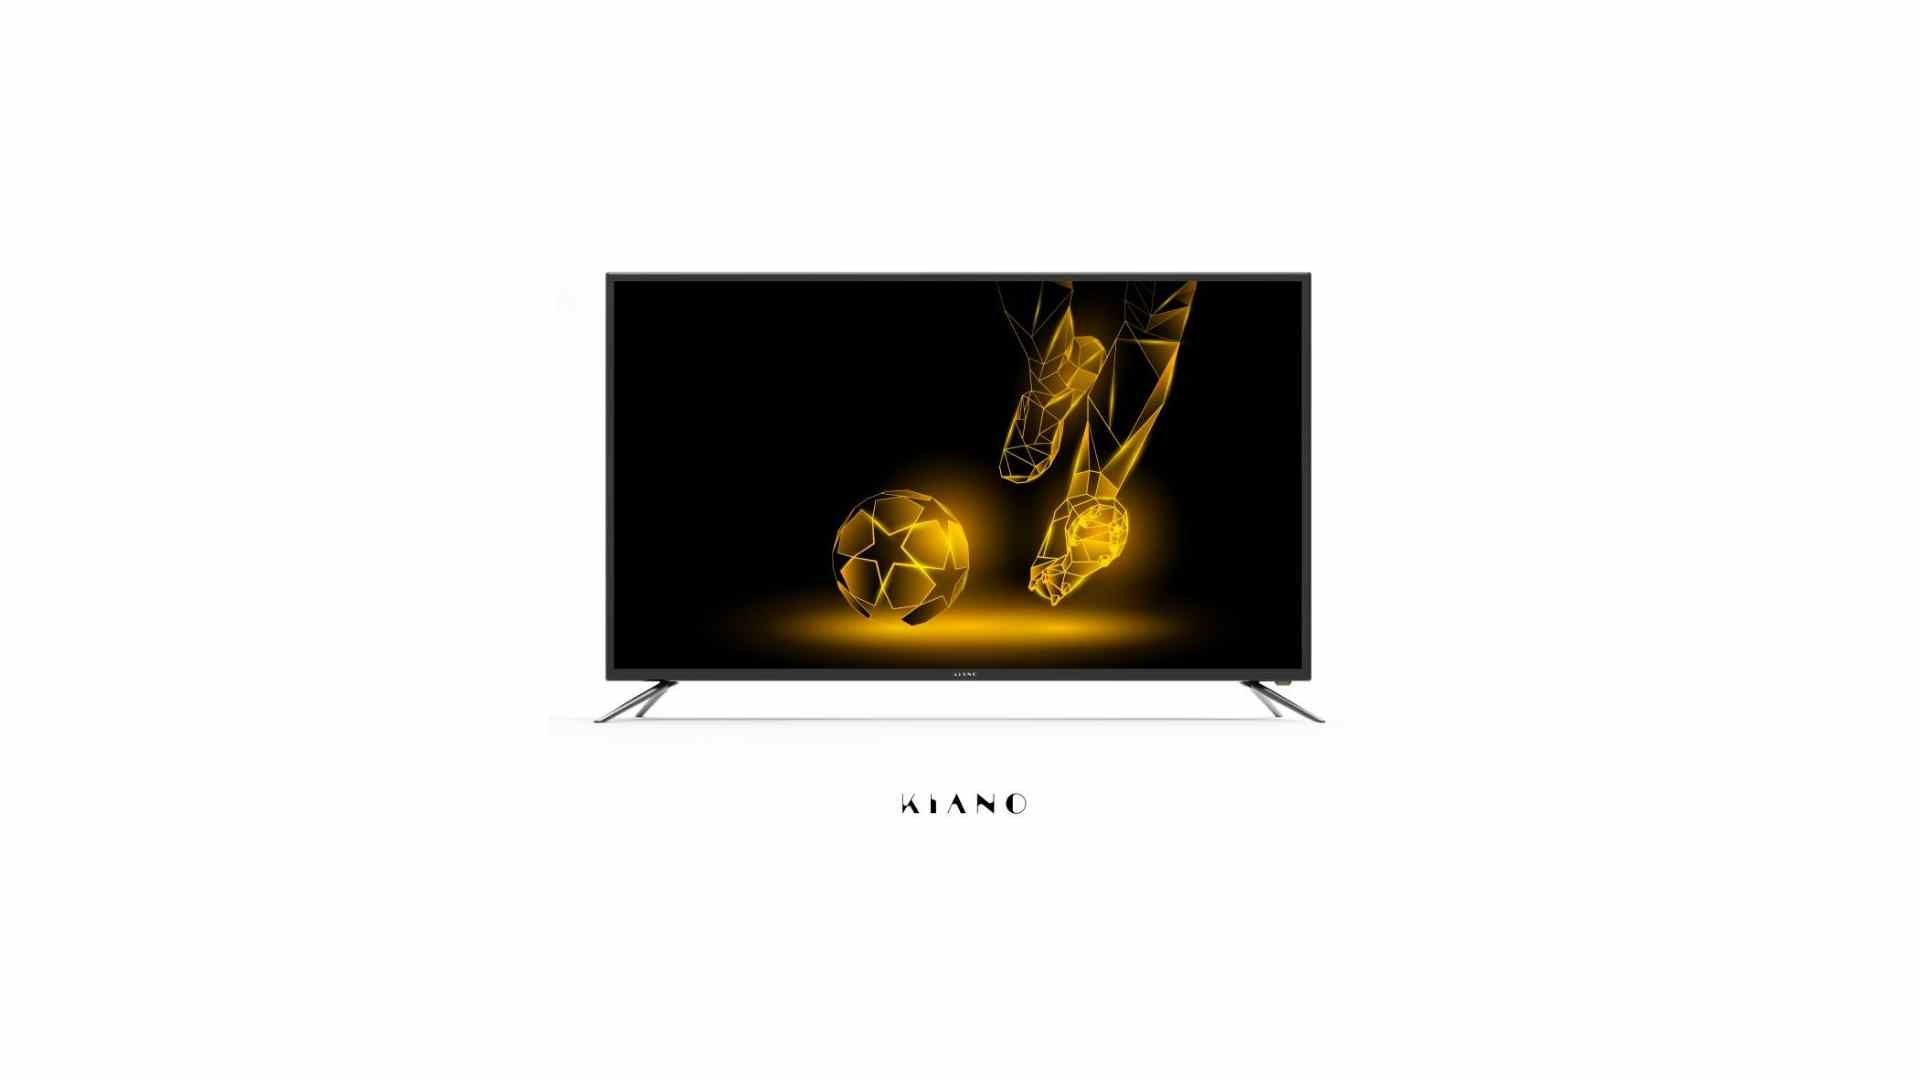 KIANO SLIM TV LED 50